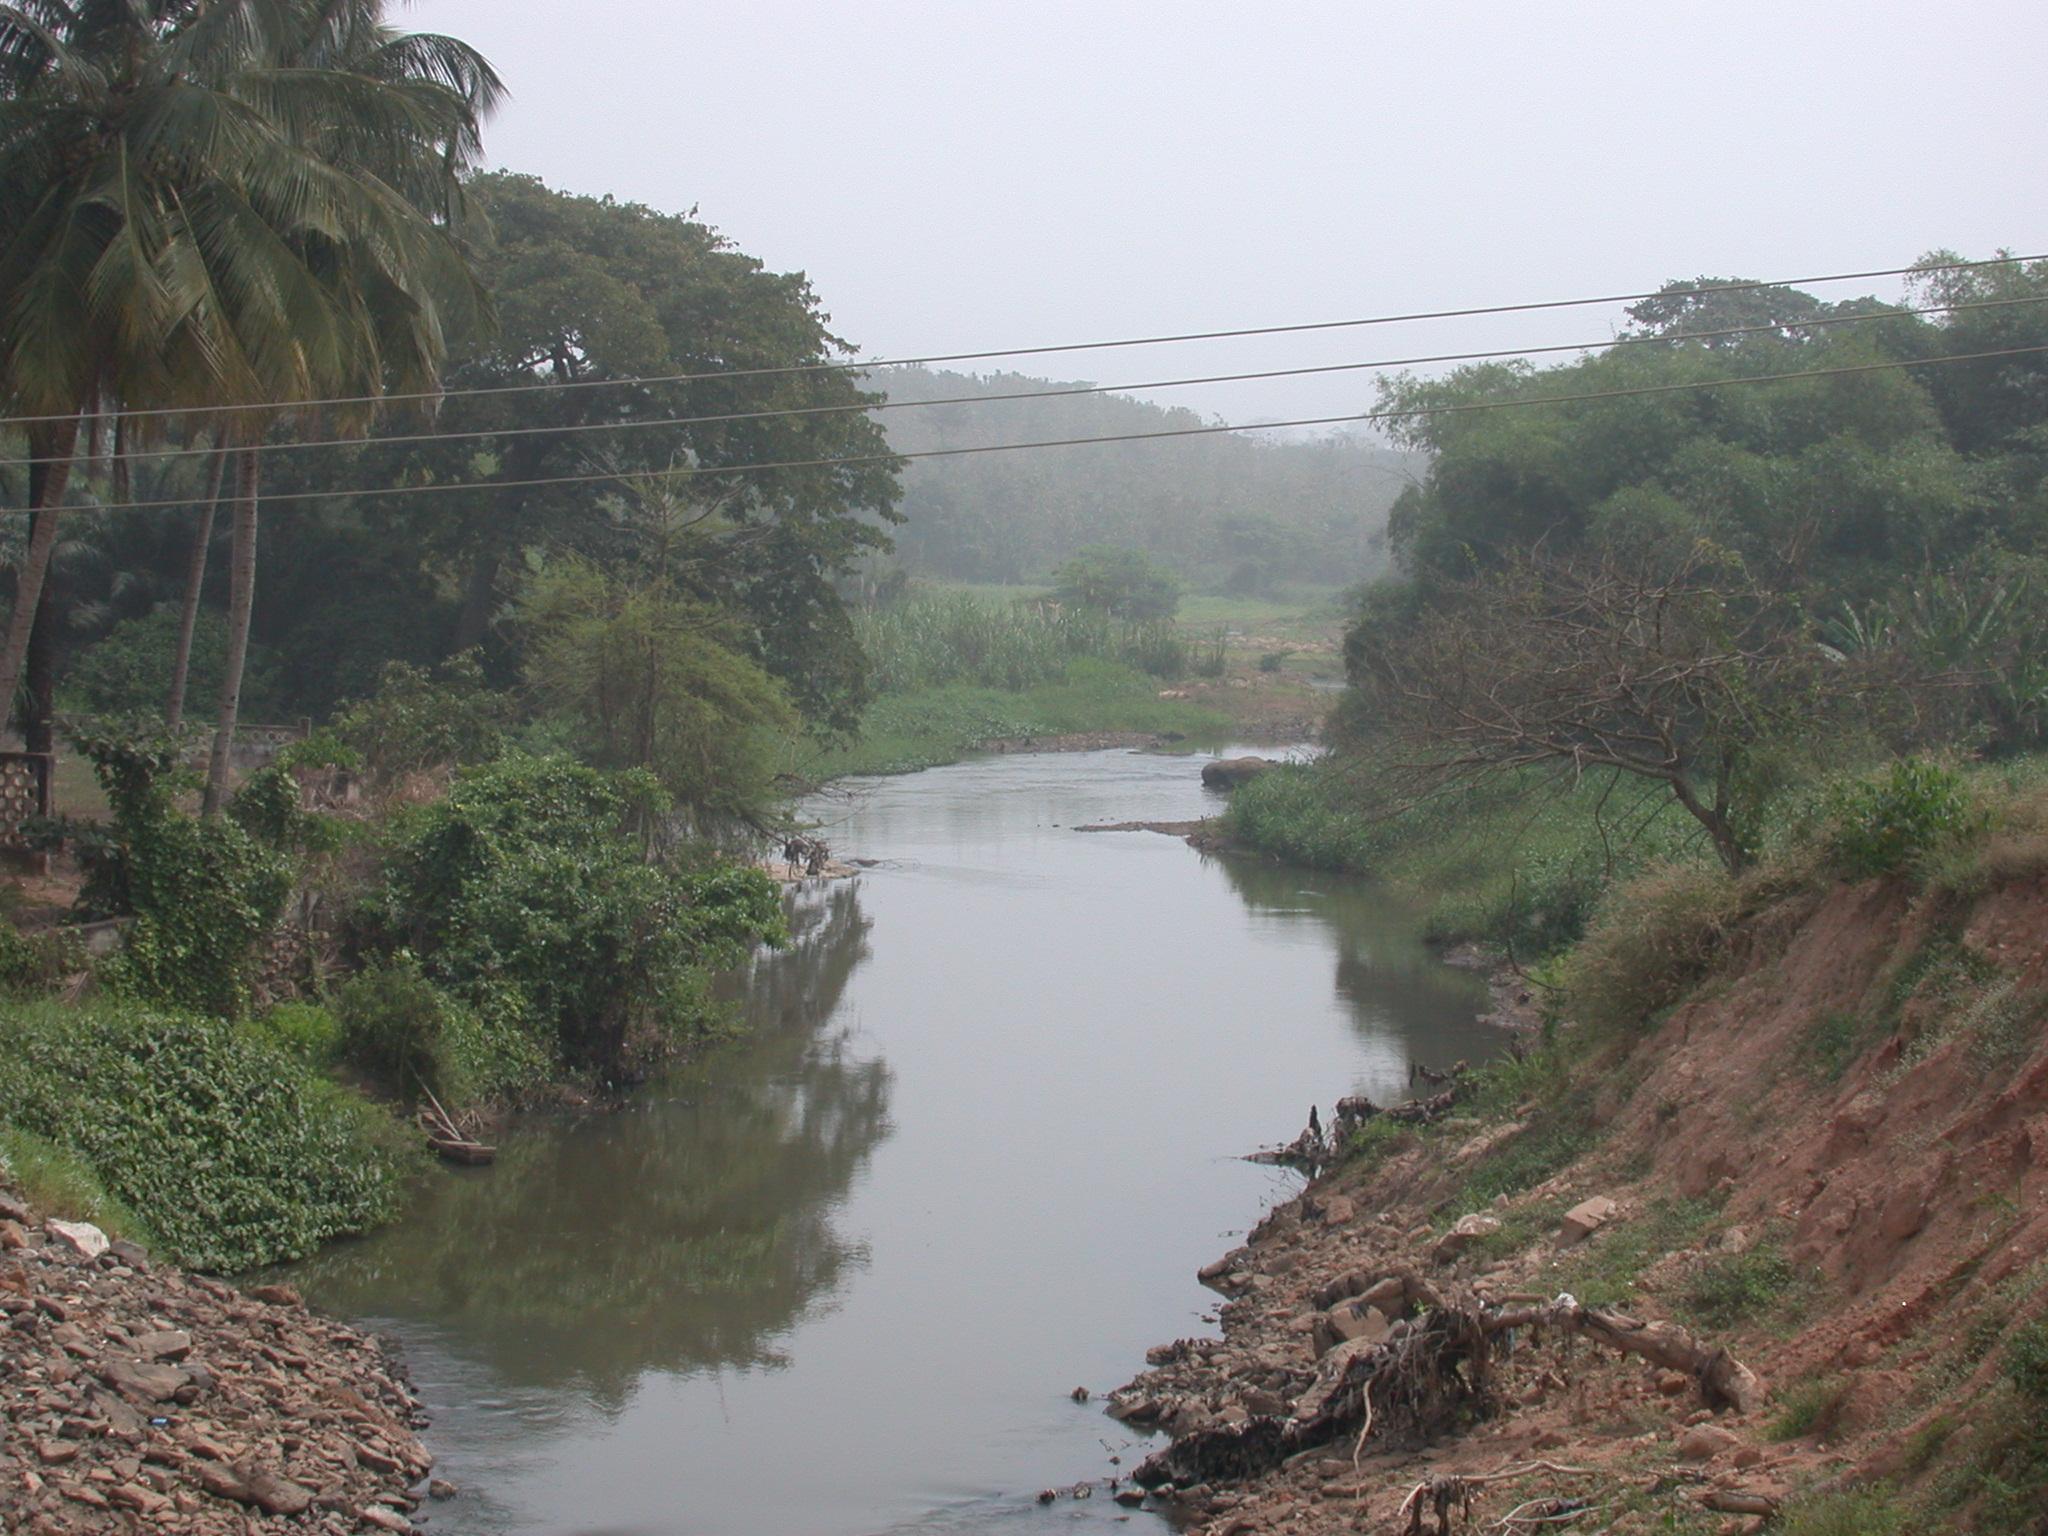 River View, Oshogbo, Nigeria